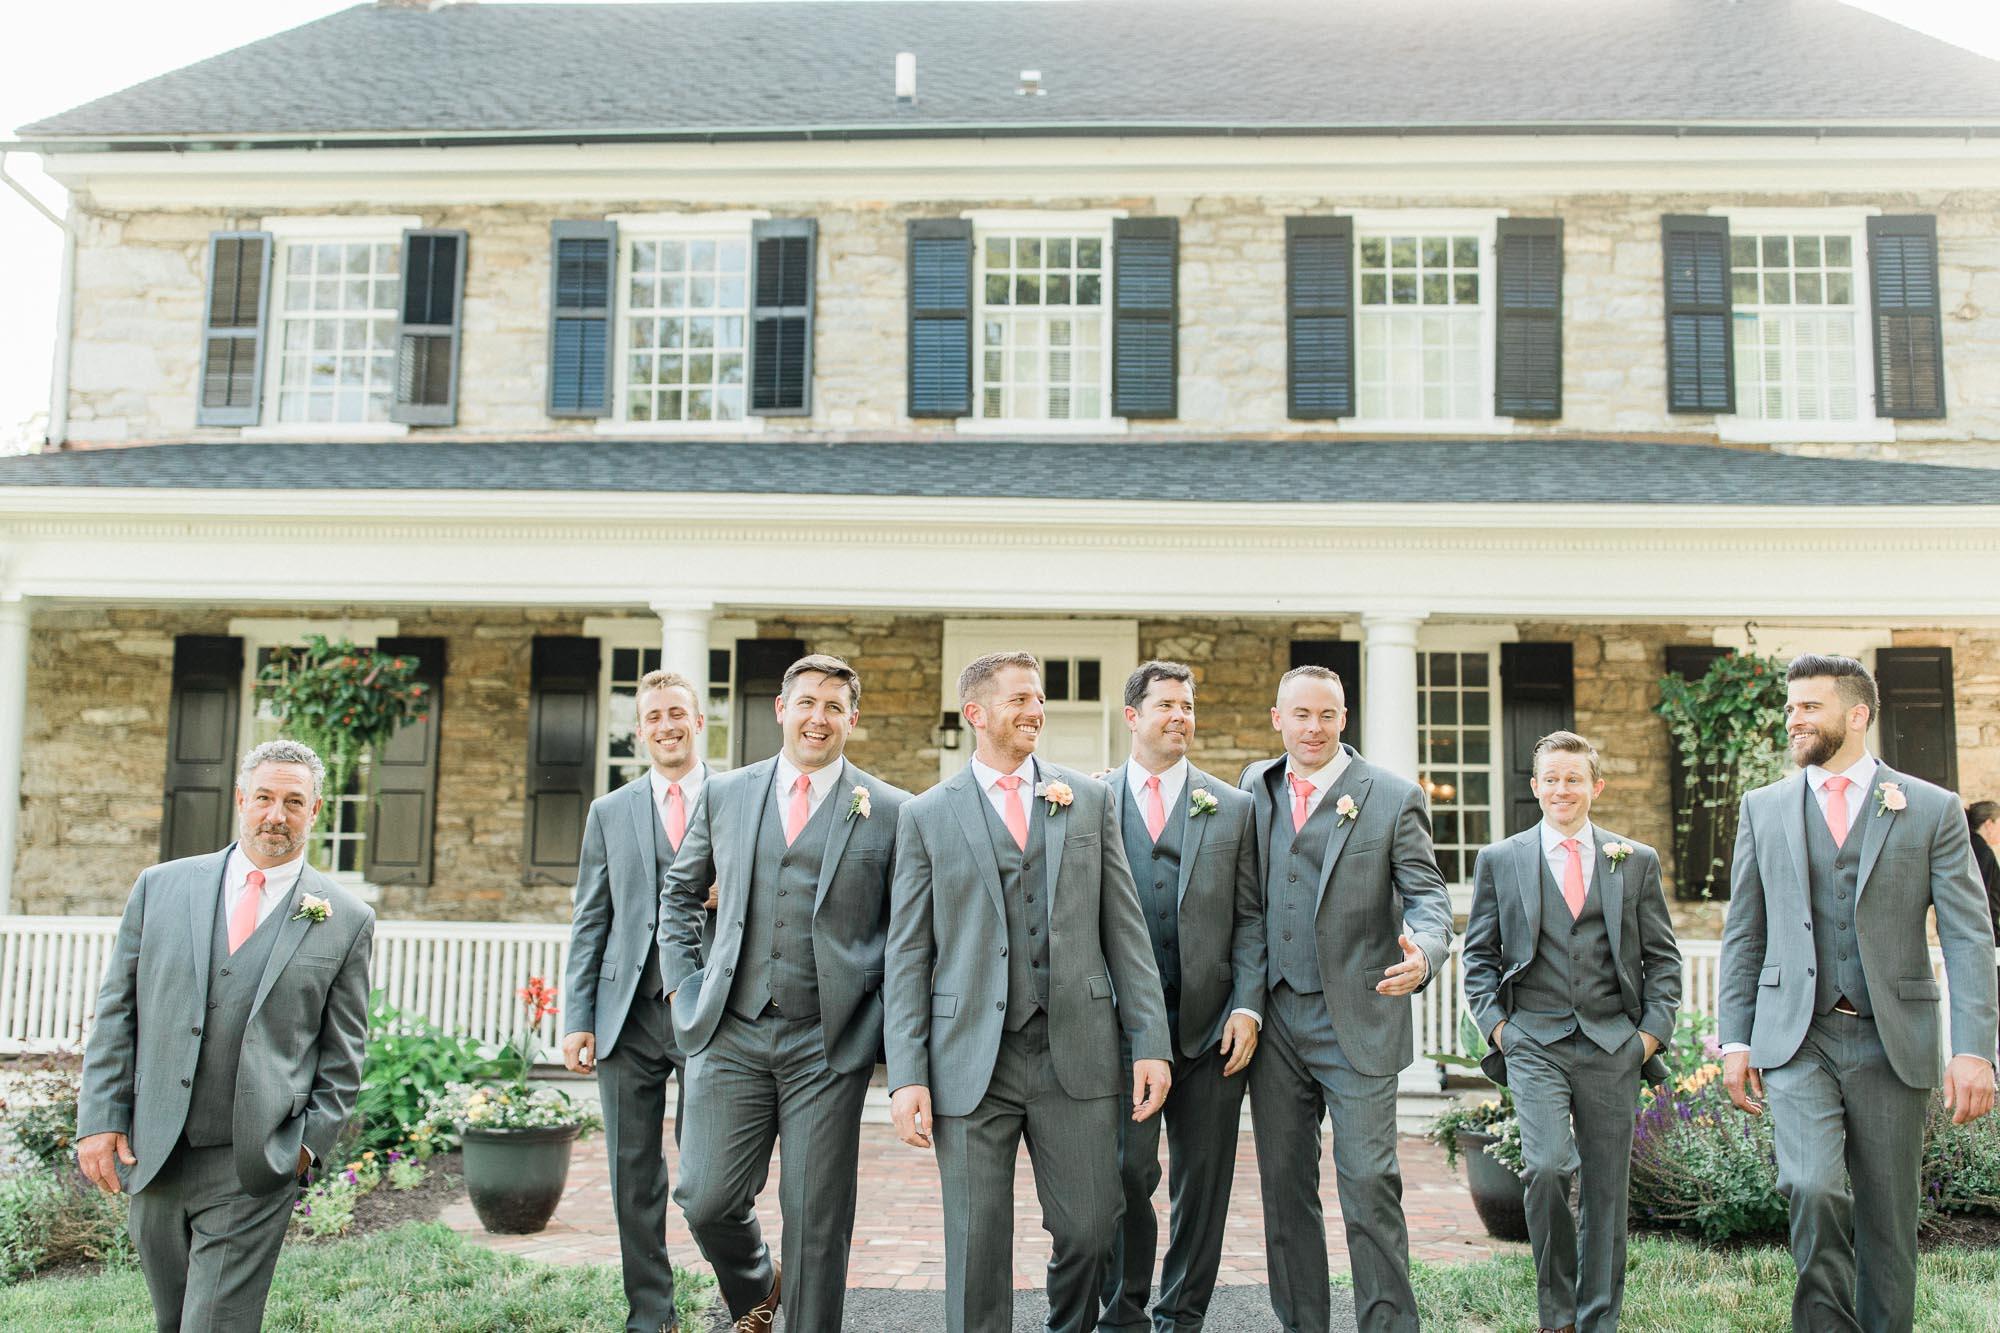 Allenberry-resort-historic-pennsylvania-wedding-10122.jpg